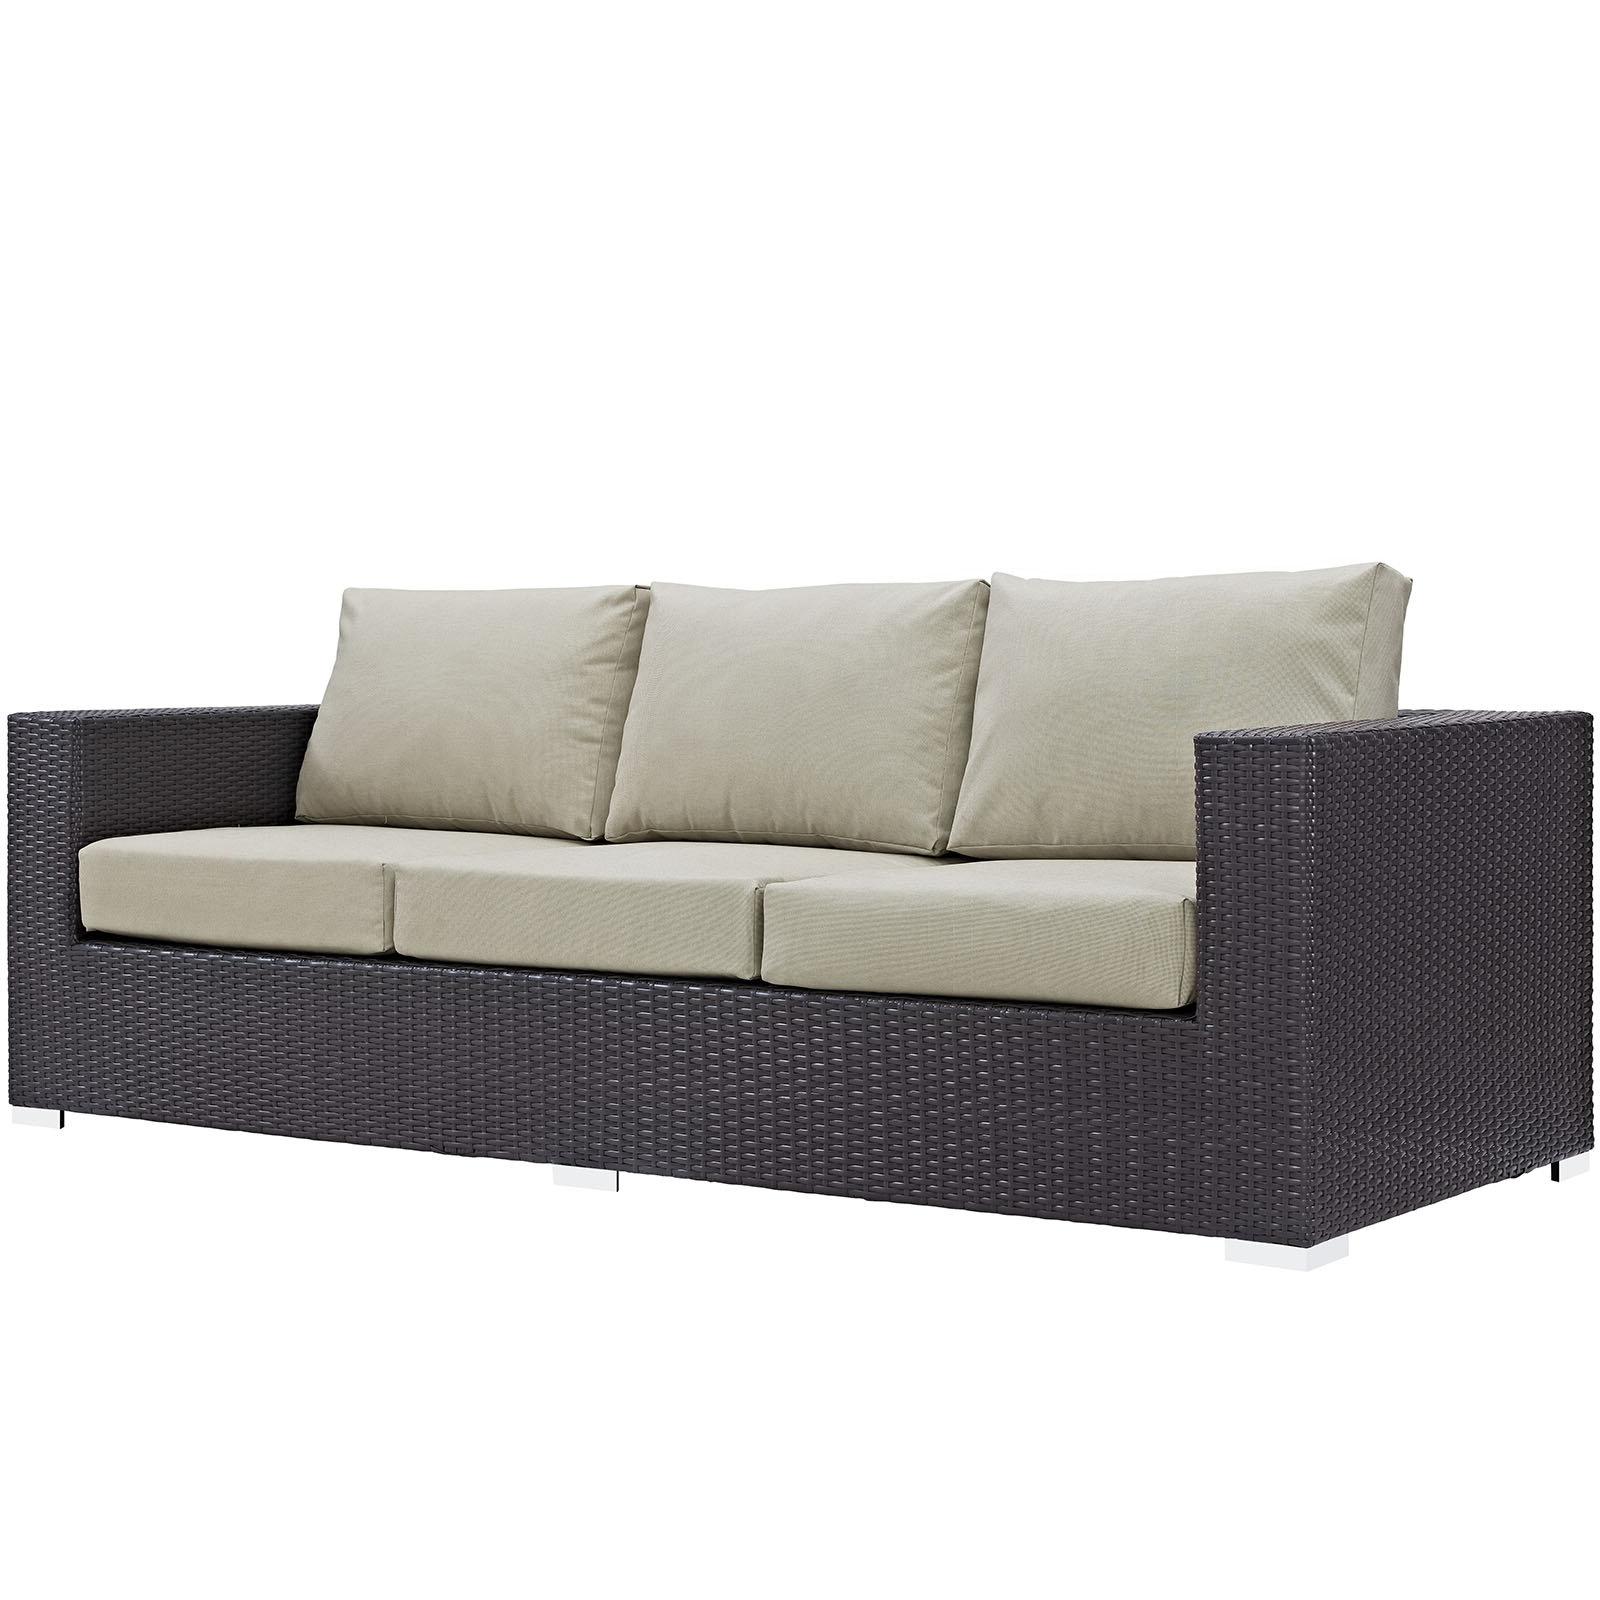 Allmodern Inside Loggins Patio Sofas With Cushions (Gallery 19 of 20)